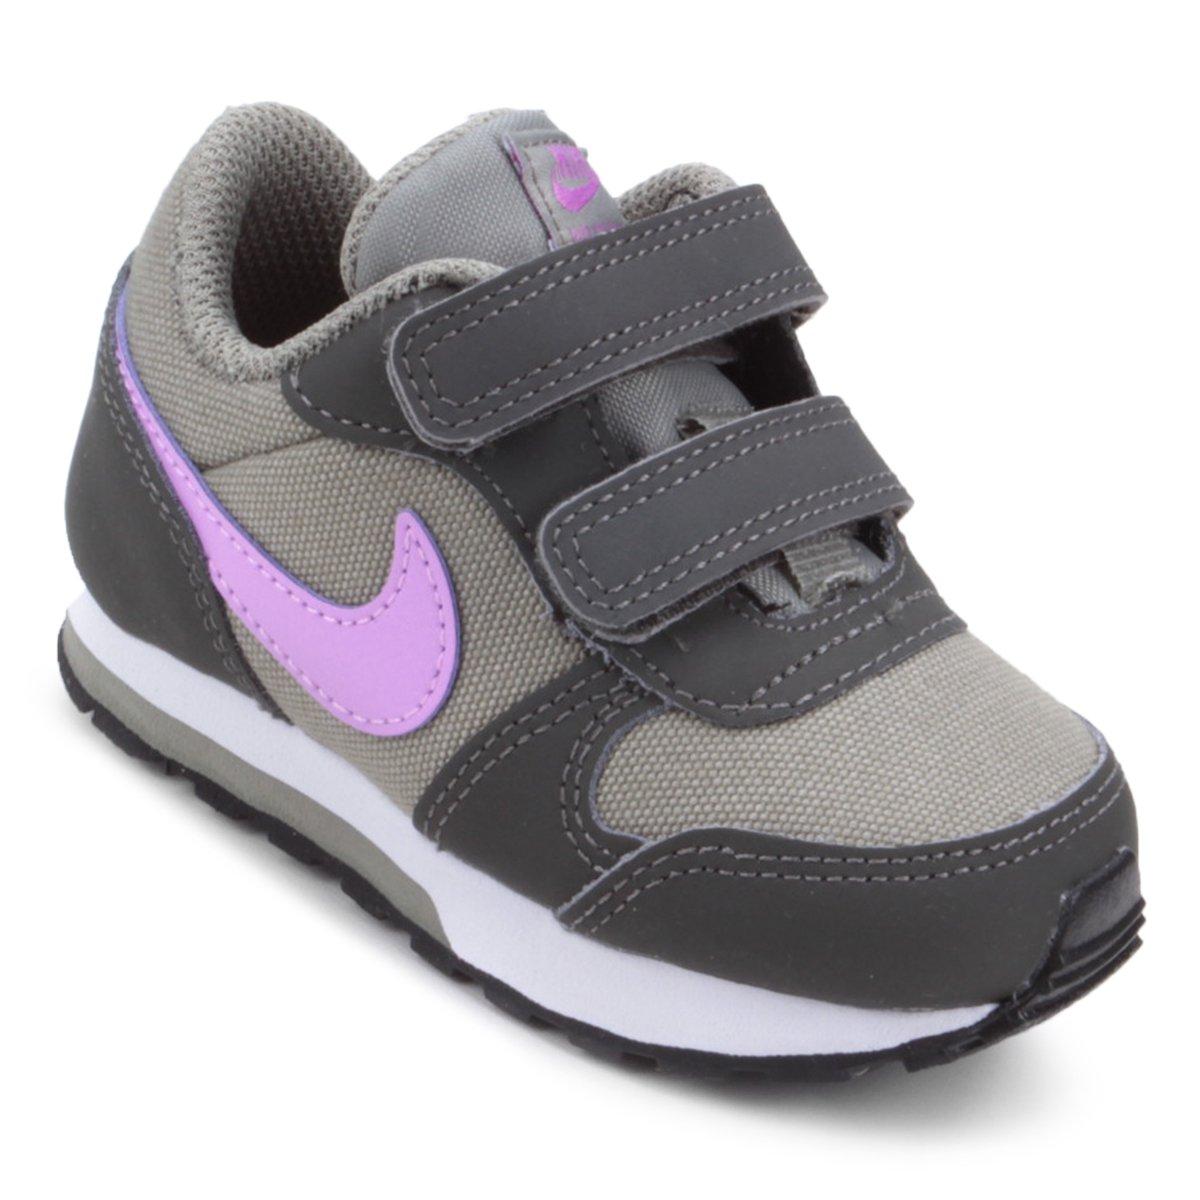 d651c1160010f Tênis Infantil Nike Md Runner 2 - Cinza e Branco | Shop Timão